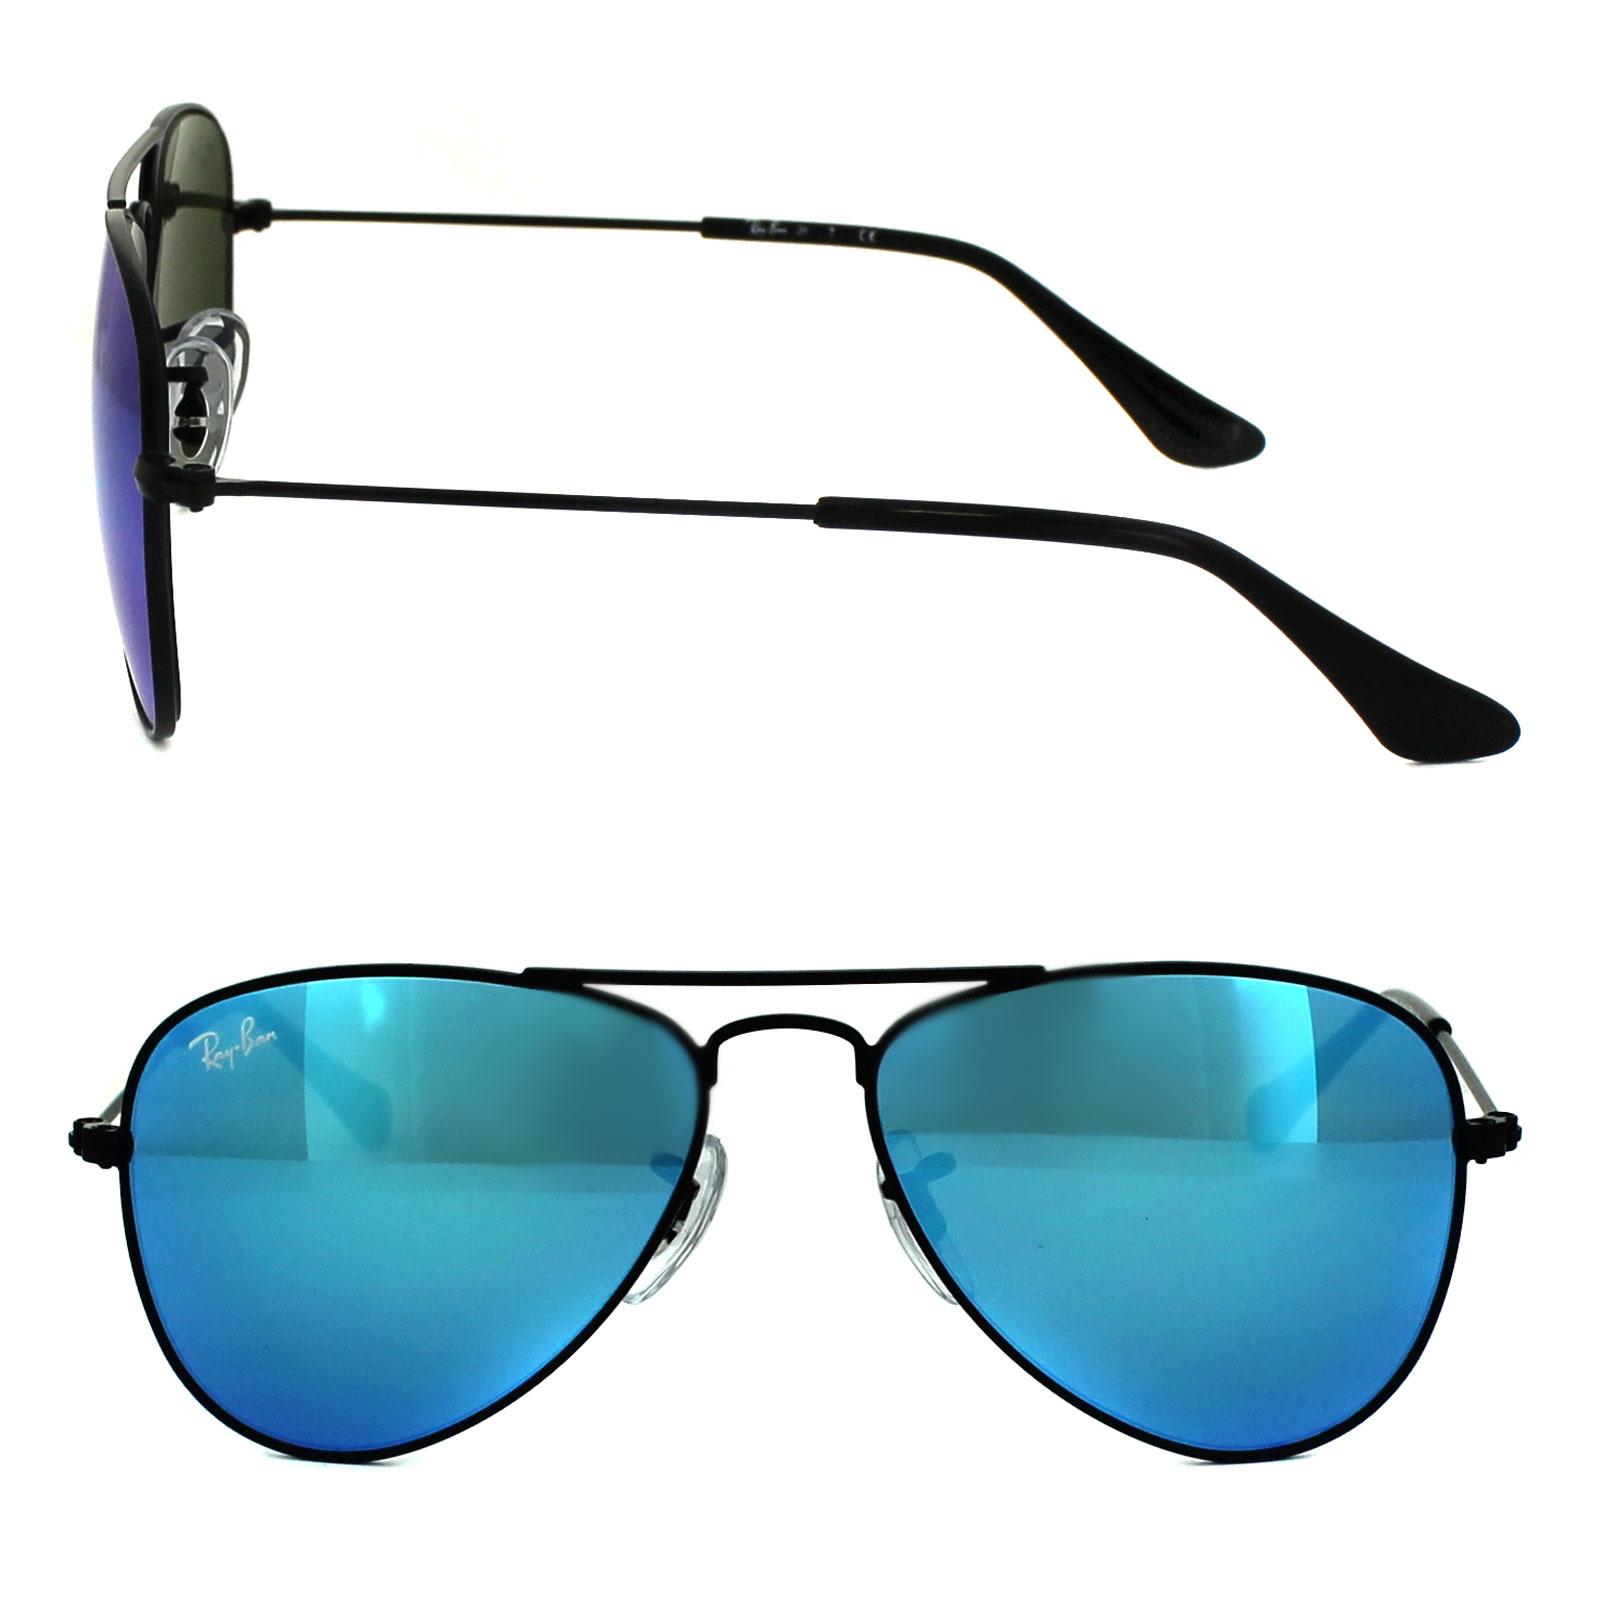 946a99f921b Sentinel Ray-Ban Junior Sunglasses 9506 201 55 Black Blue Flash Mirror